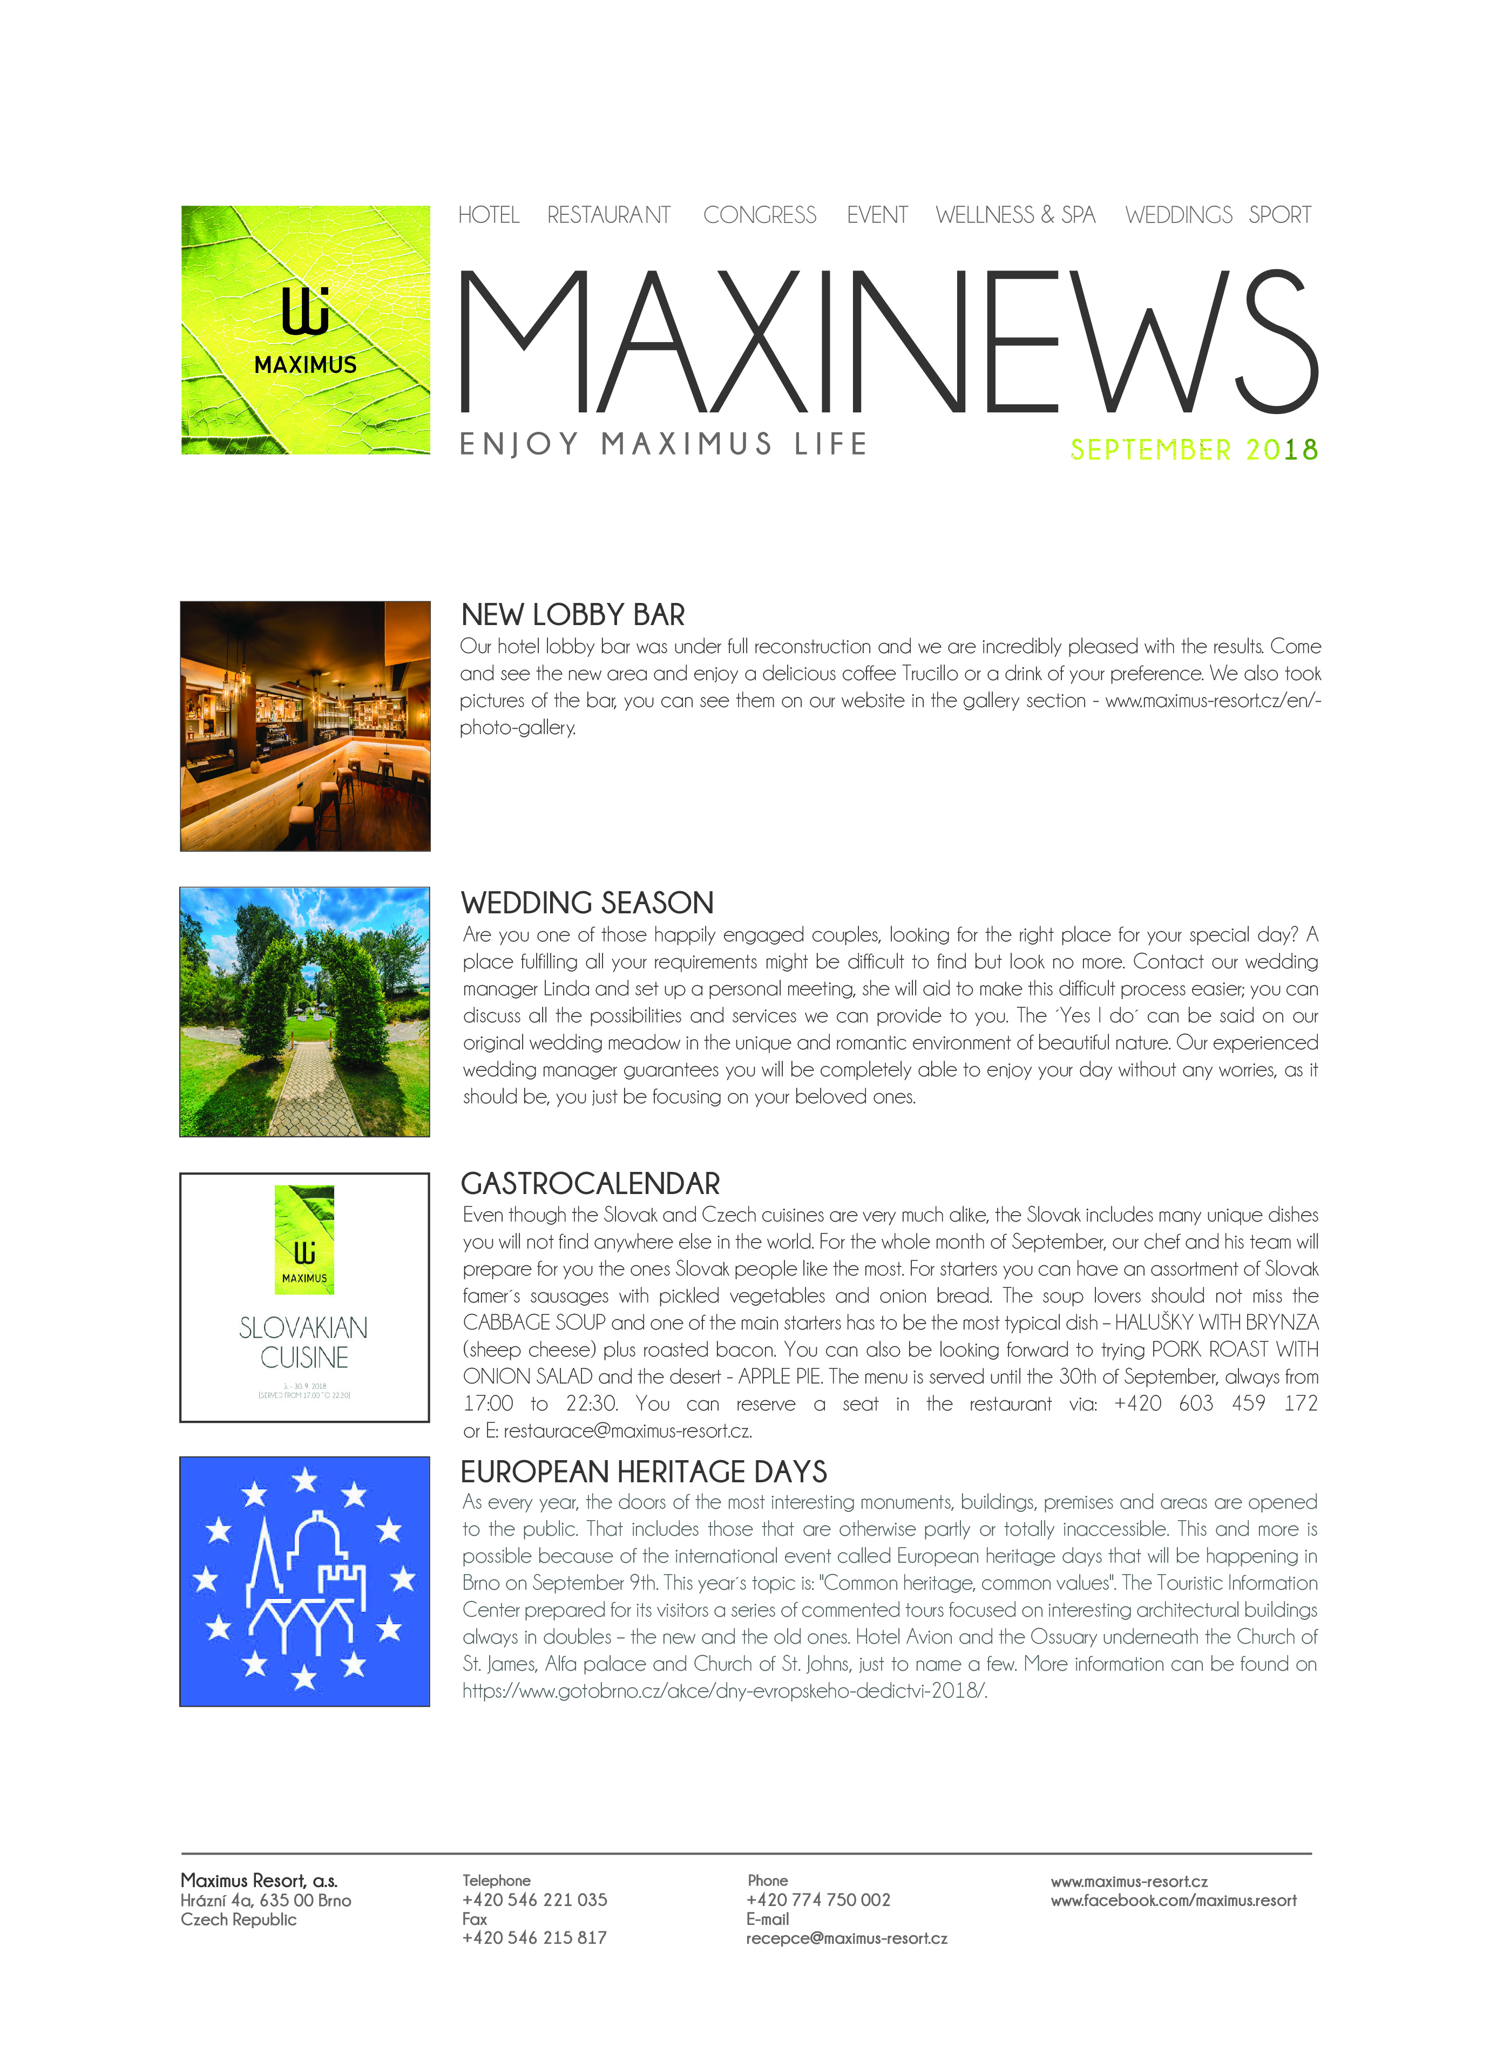 EN_maxinews_web